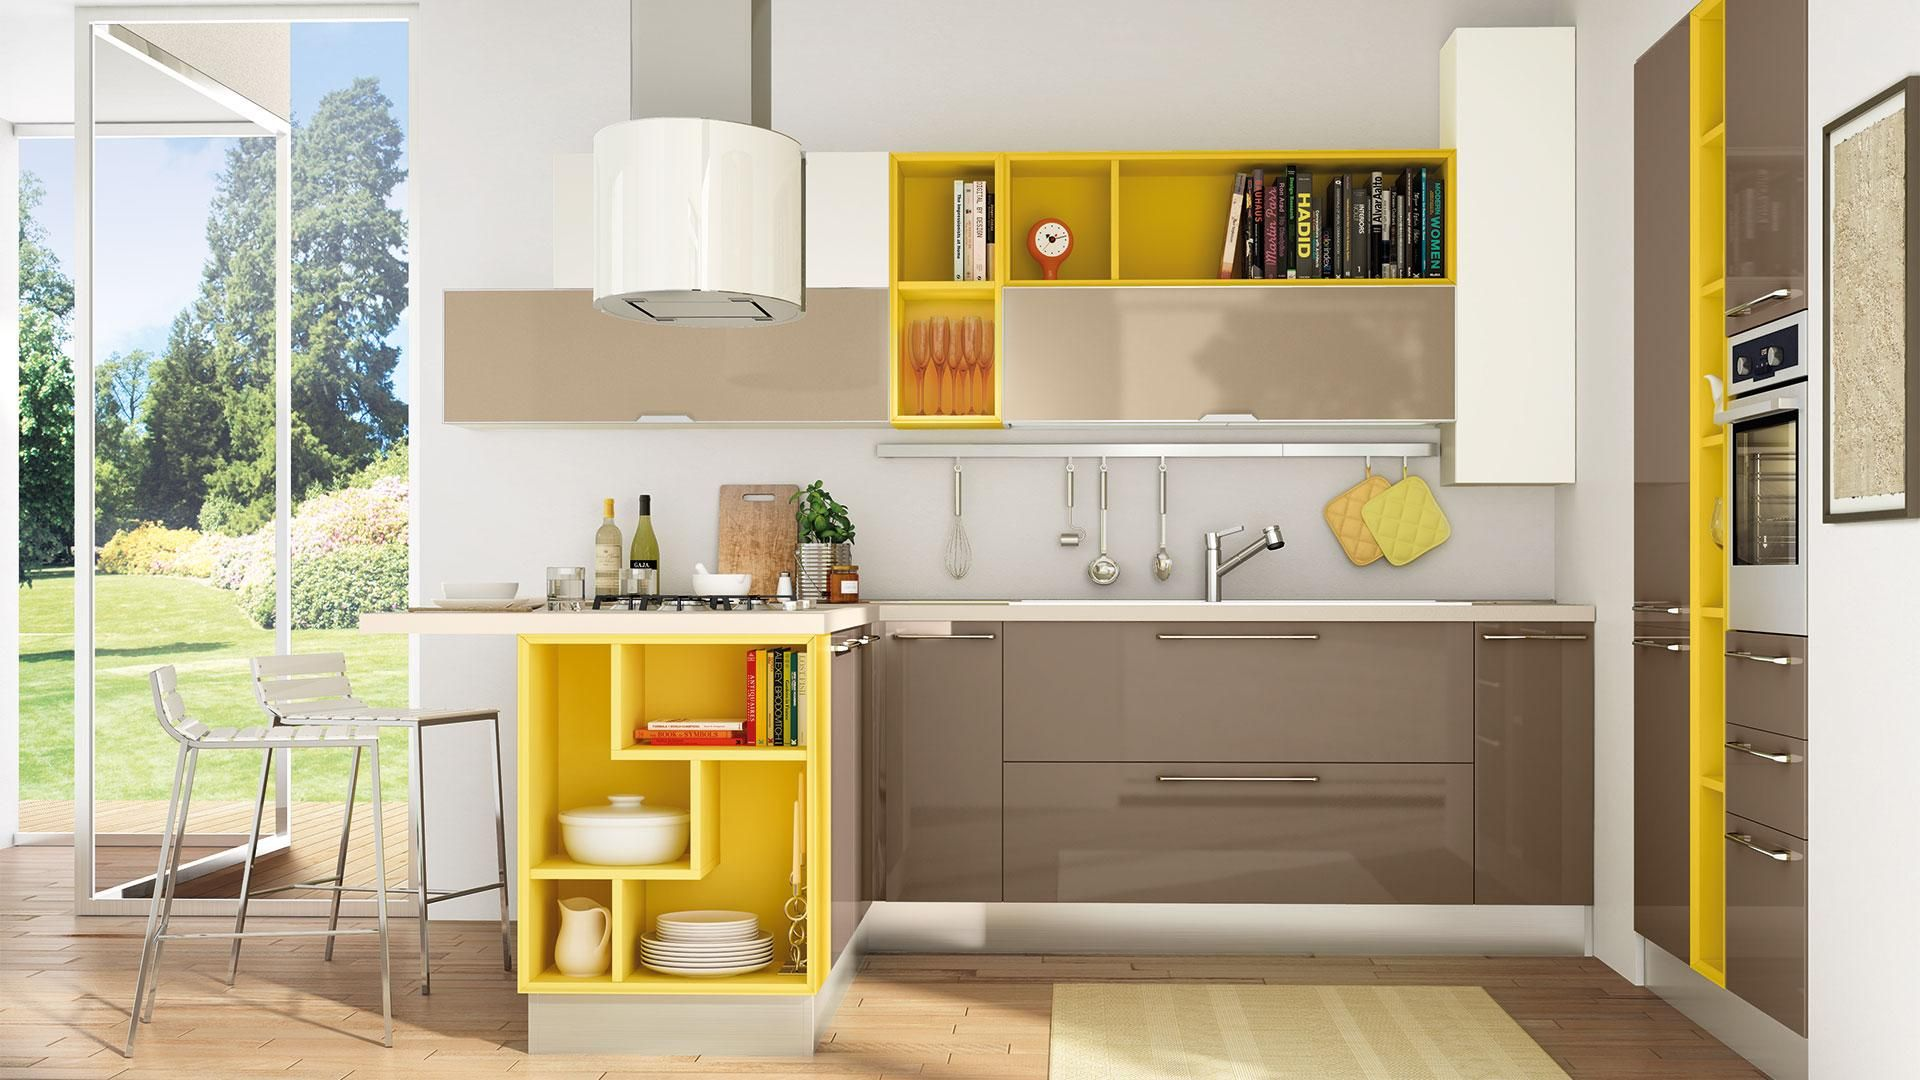 Noemi - Cucine Moderne - Cucine Lube | Idee per la casa | Pinterest ...